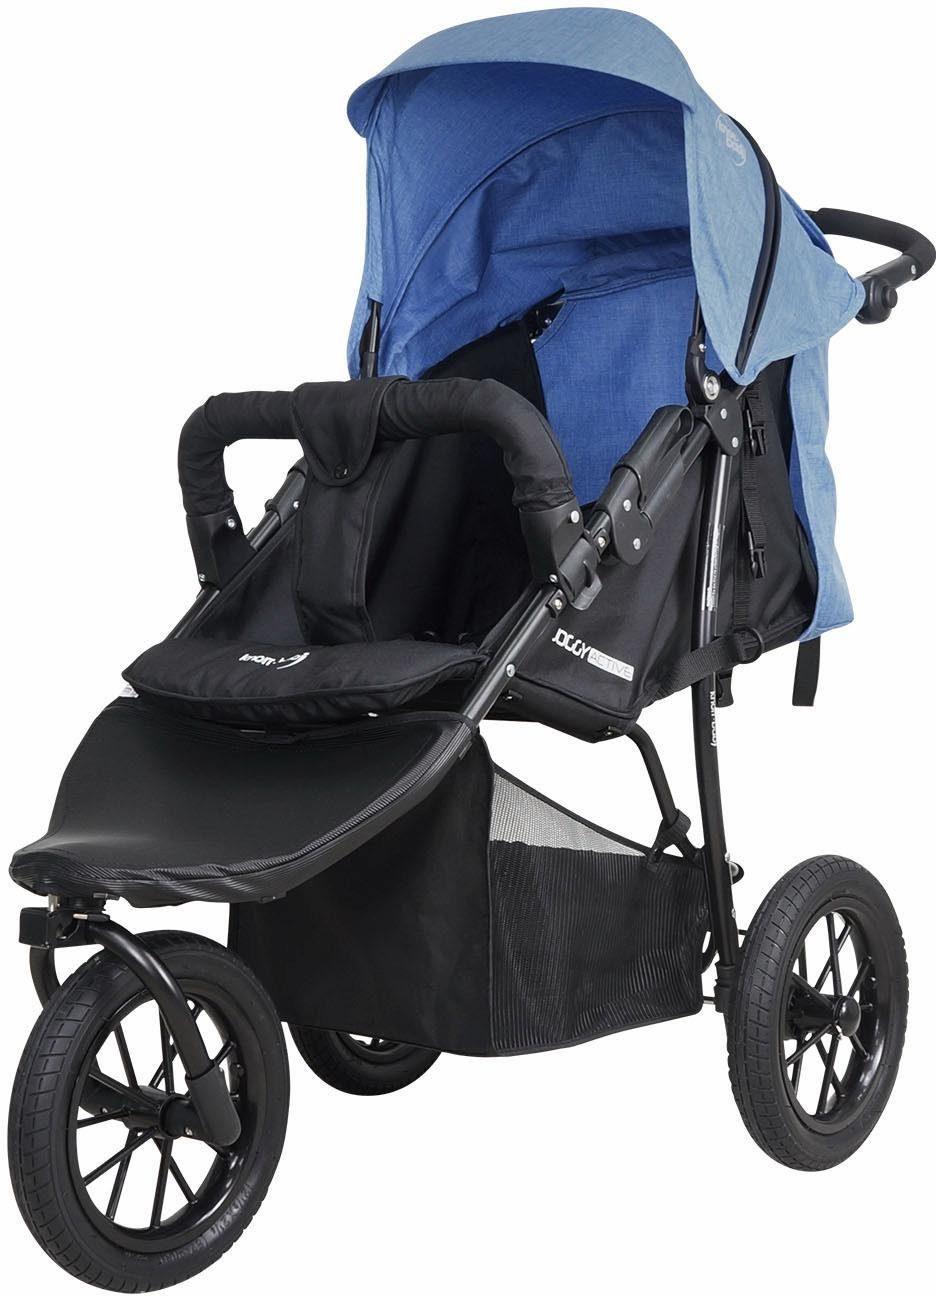 knorr-baby Jogger-Kinderwagen, »Joggy Novo Active, schwarz-jeans«